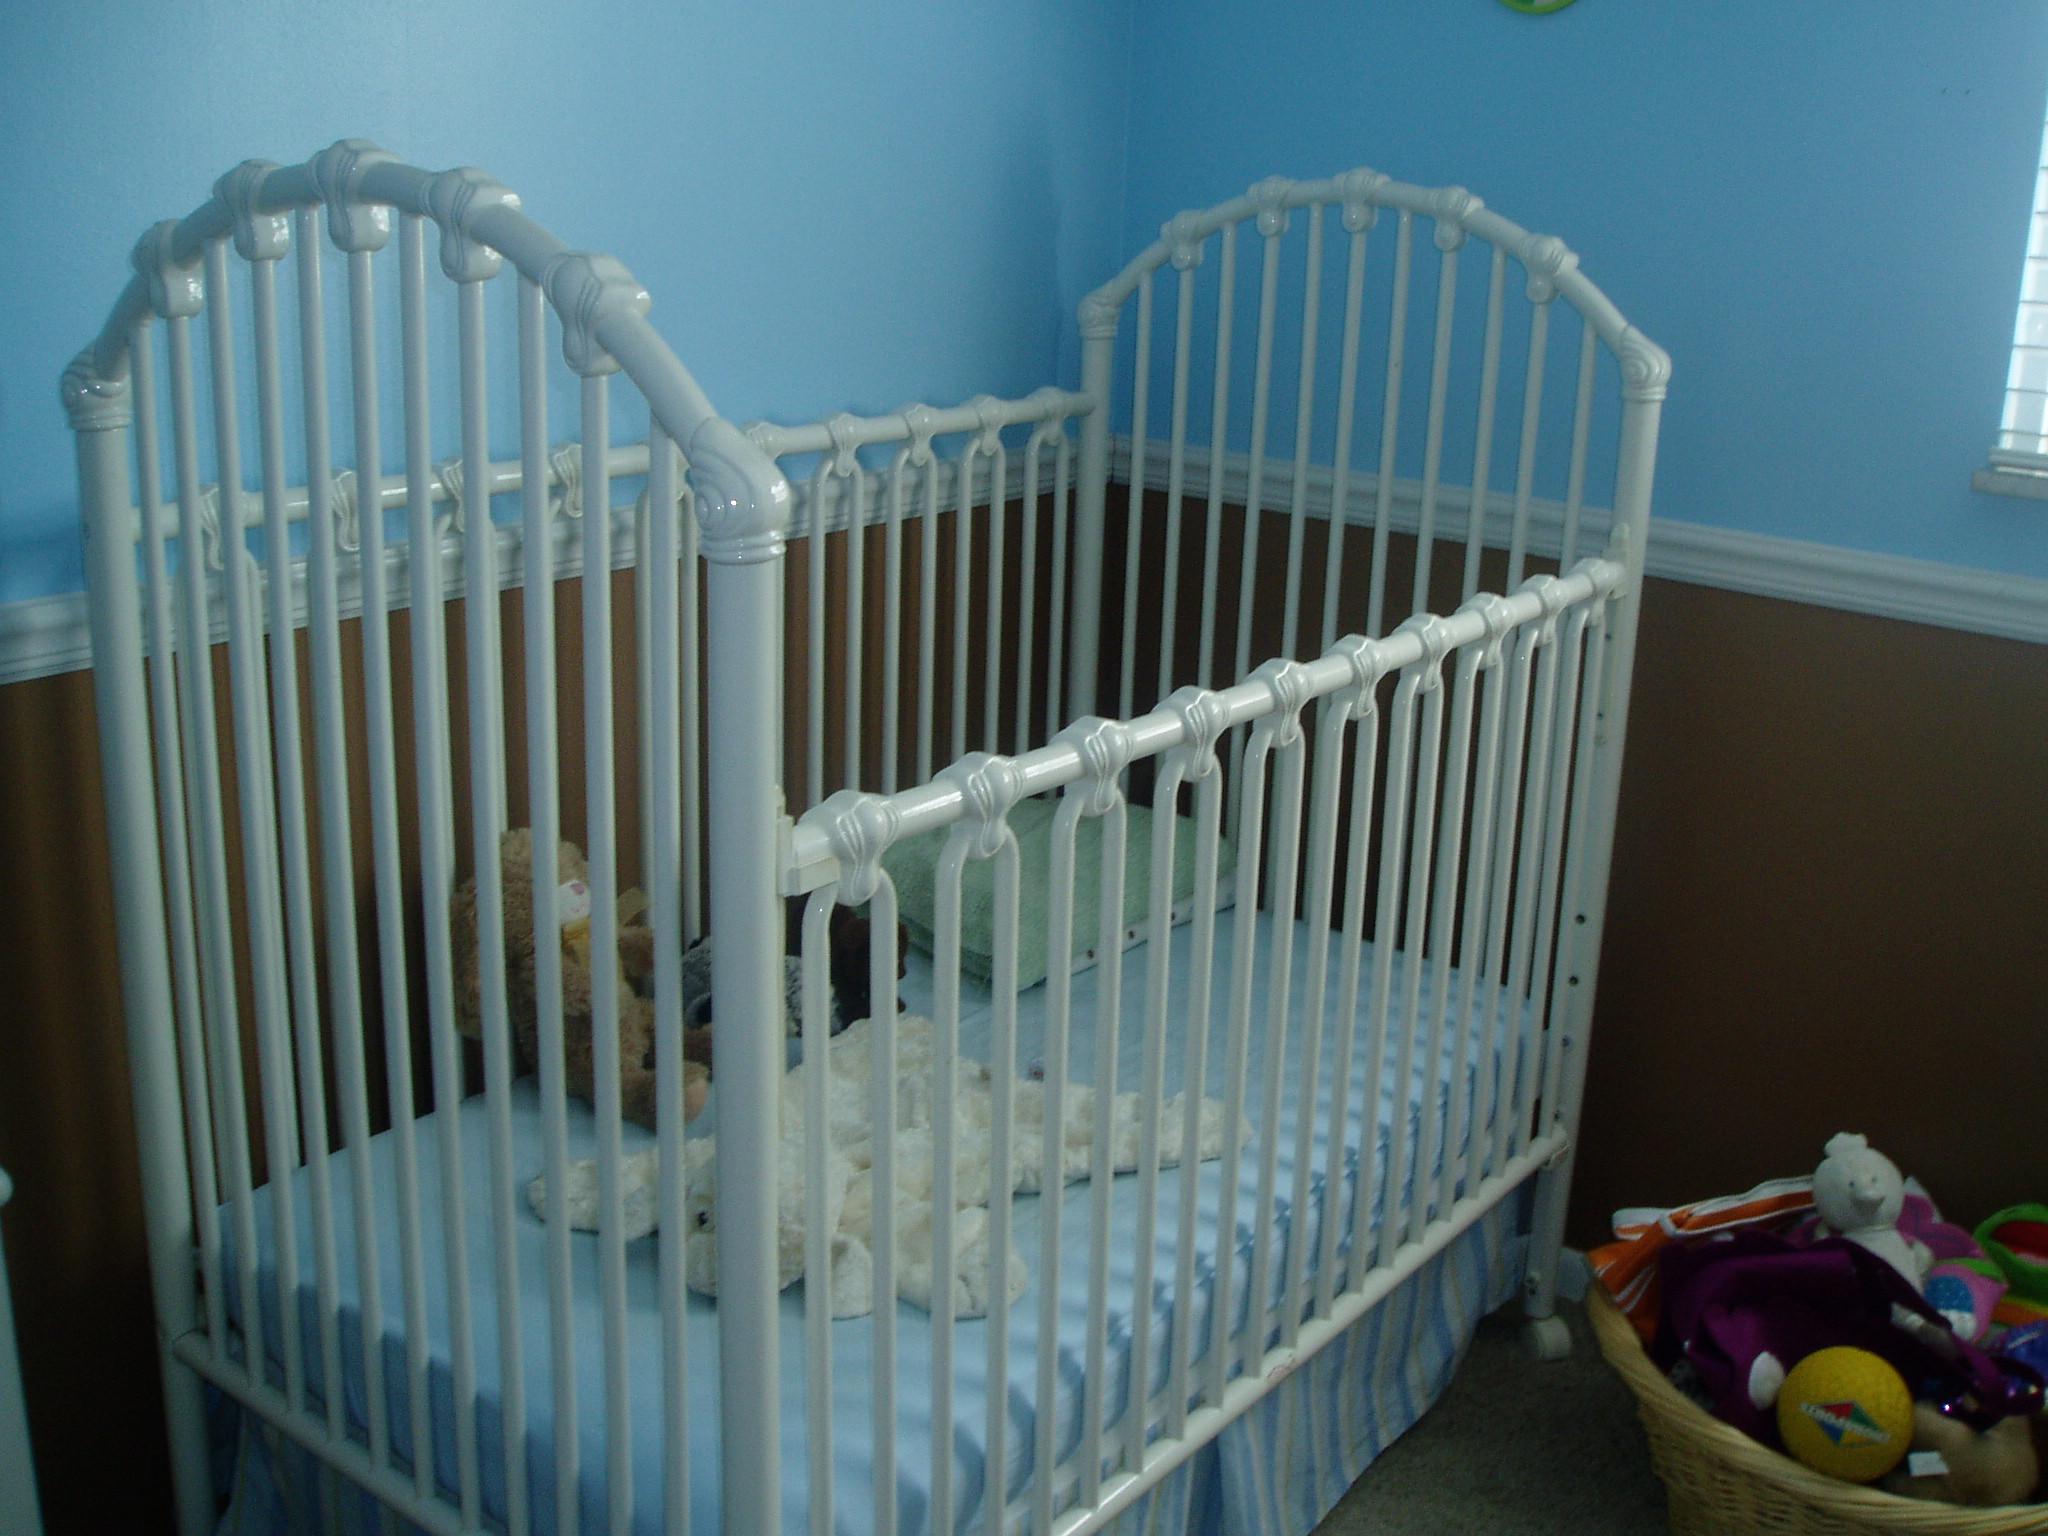 Gallery of iron crib for sale craigslist